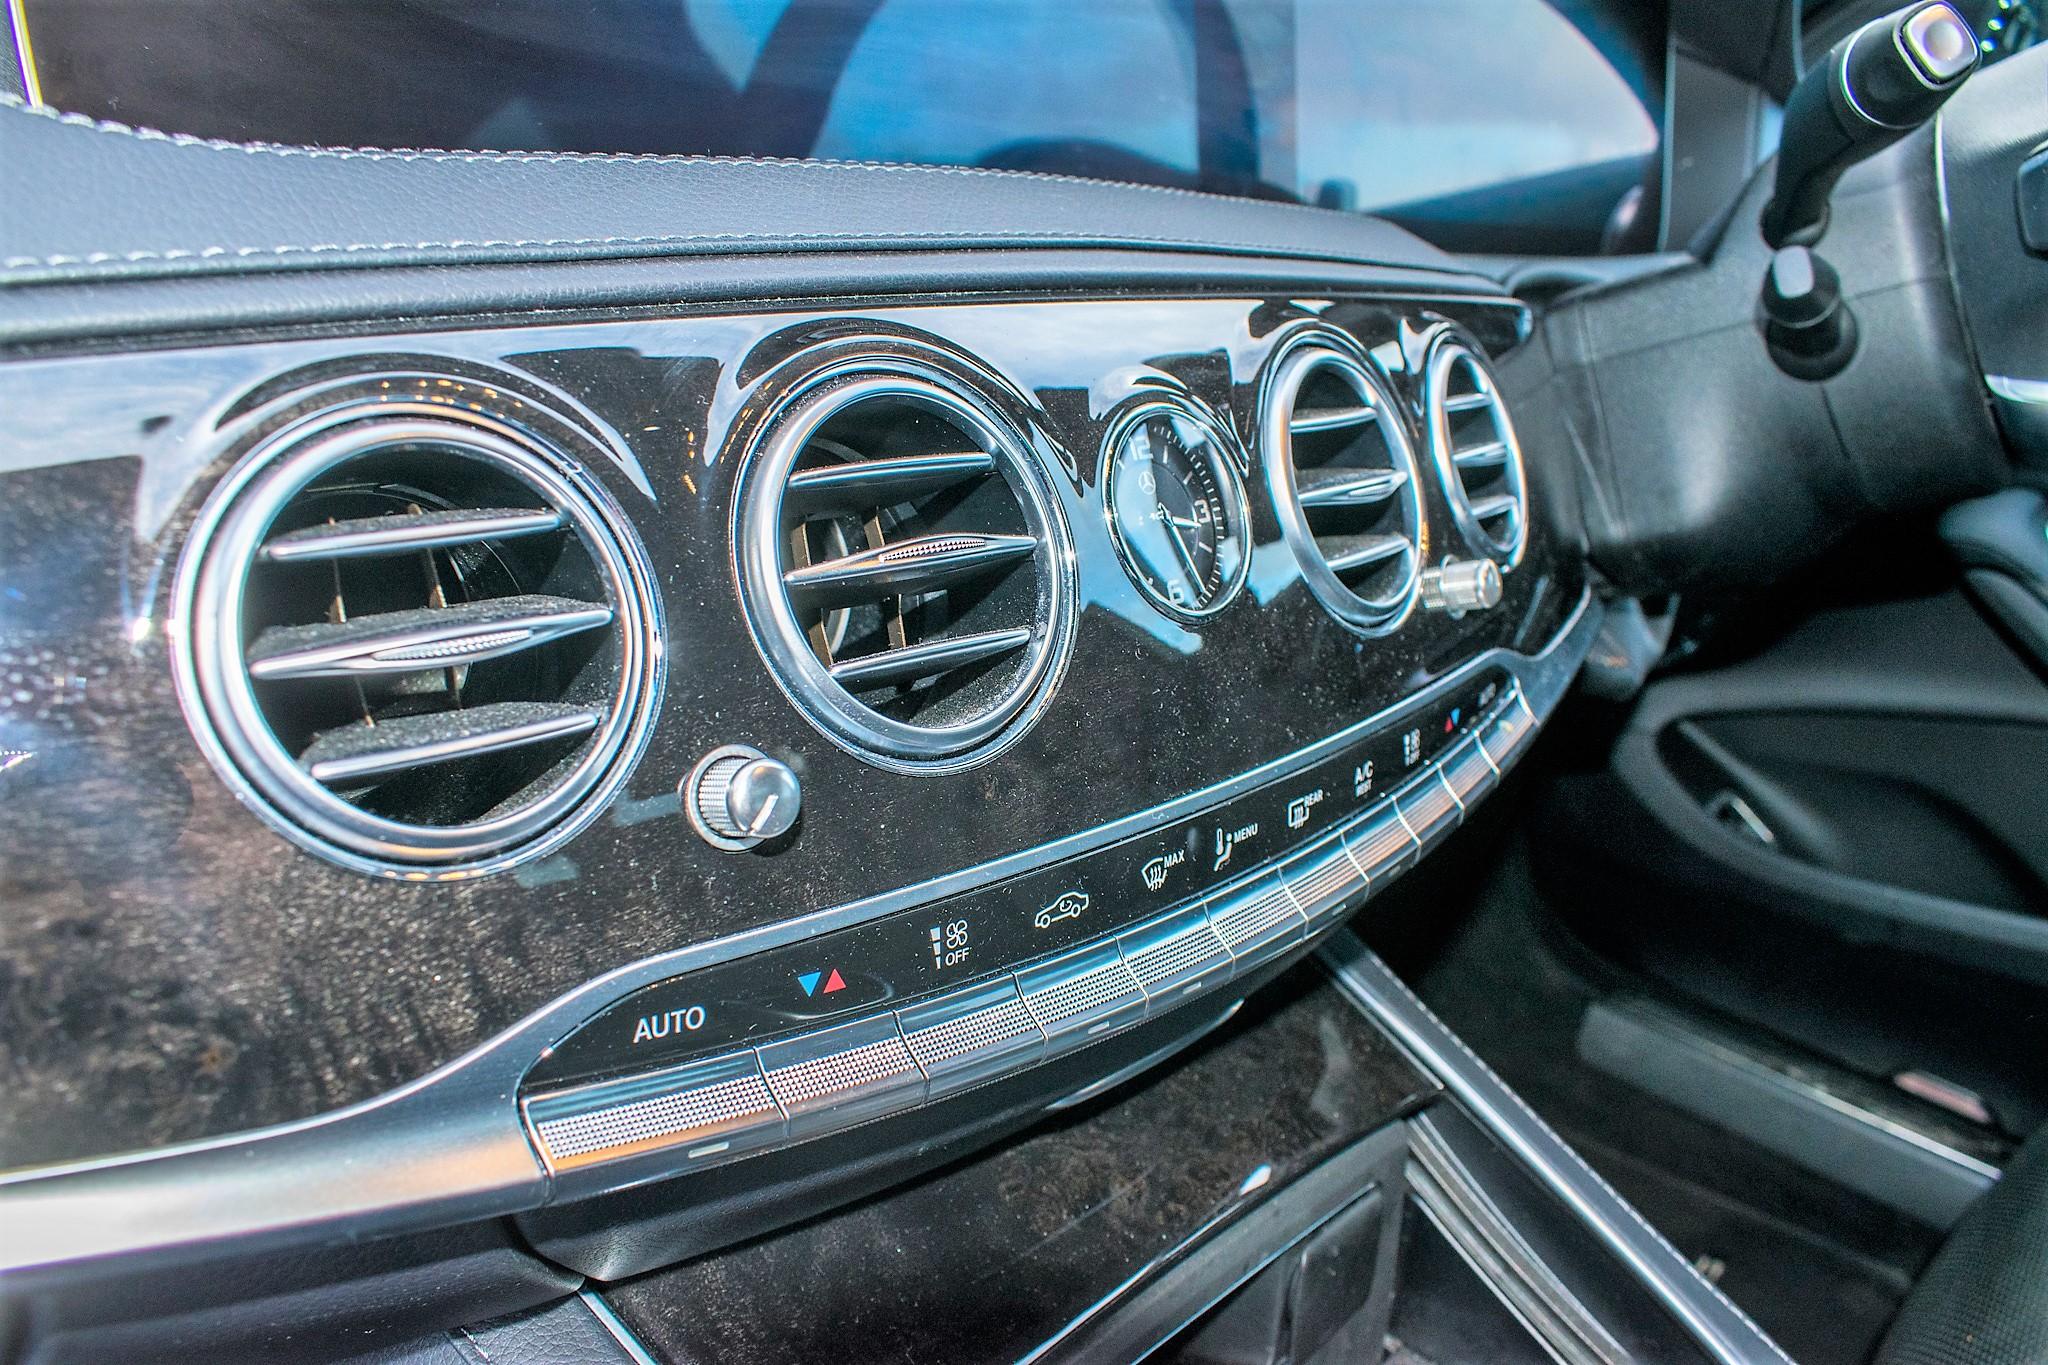 Mercedes Benz S450 L AMG Line Executive auto petrol 4 door saloon car Registration Number: FX68 - Image 30 of 33